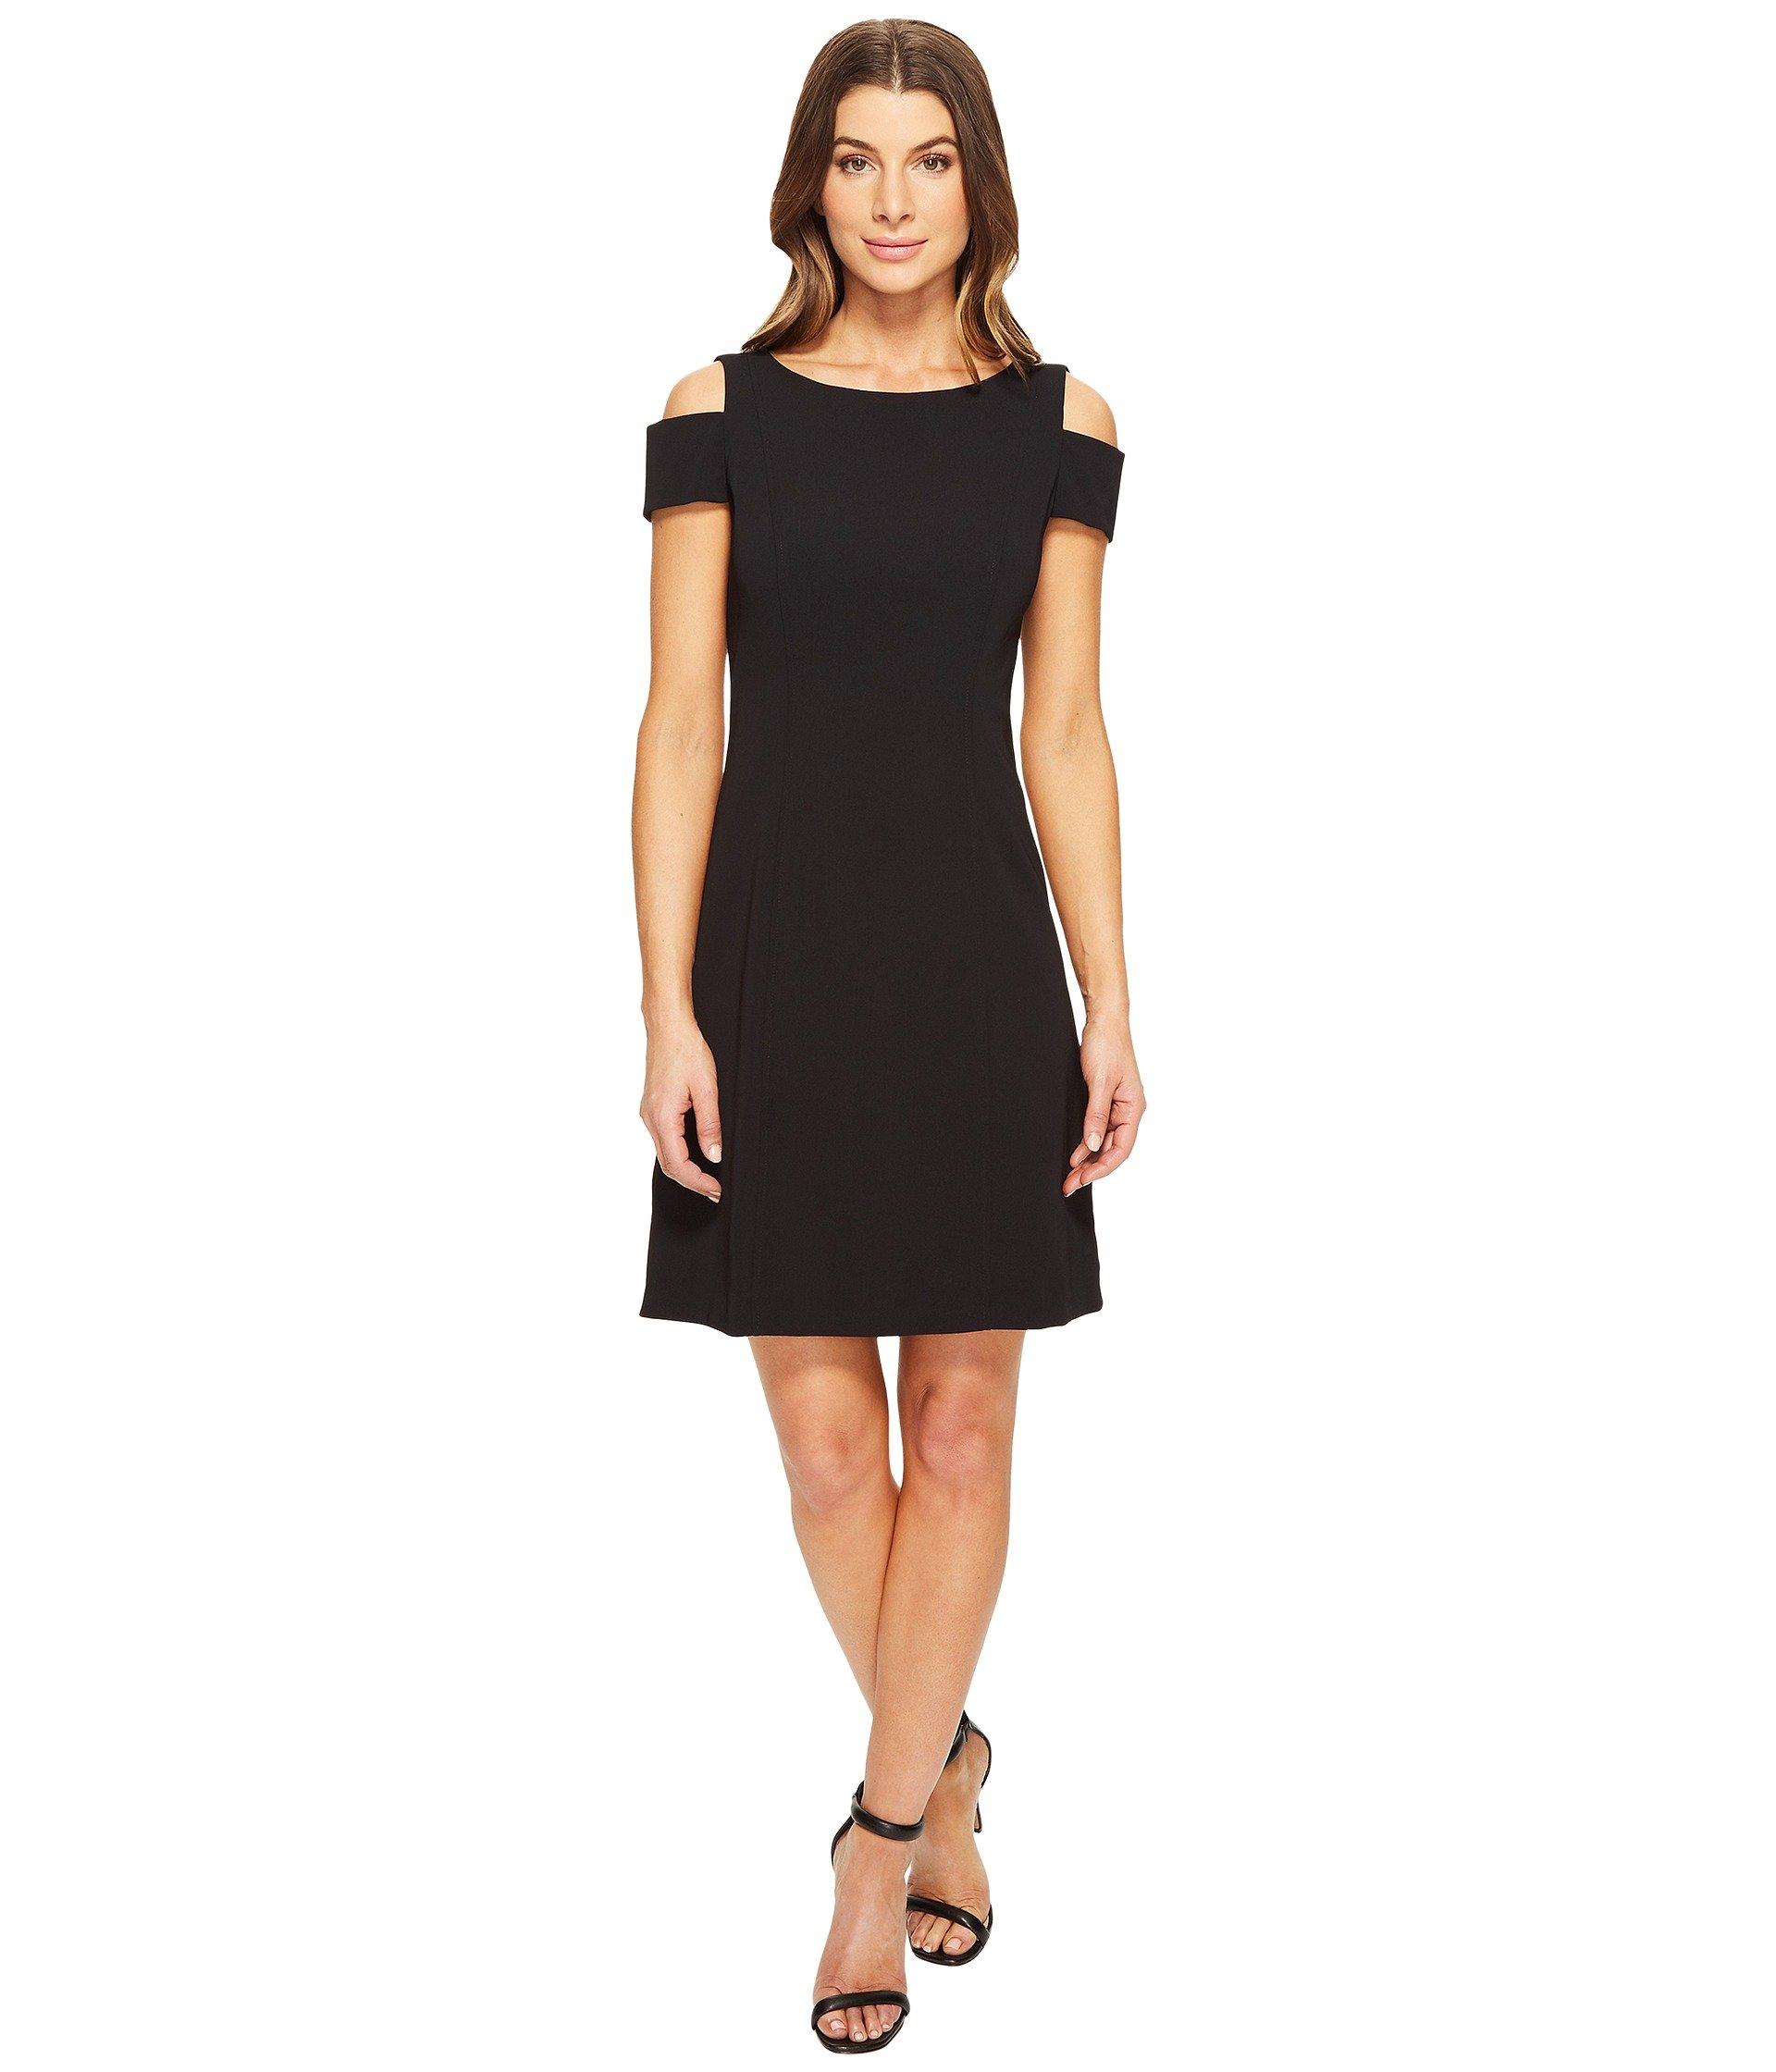 Power Stretch Cold Shoulder A-Line Dress